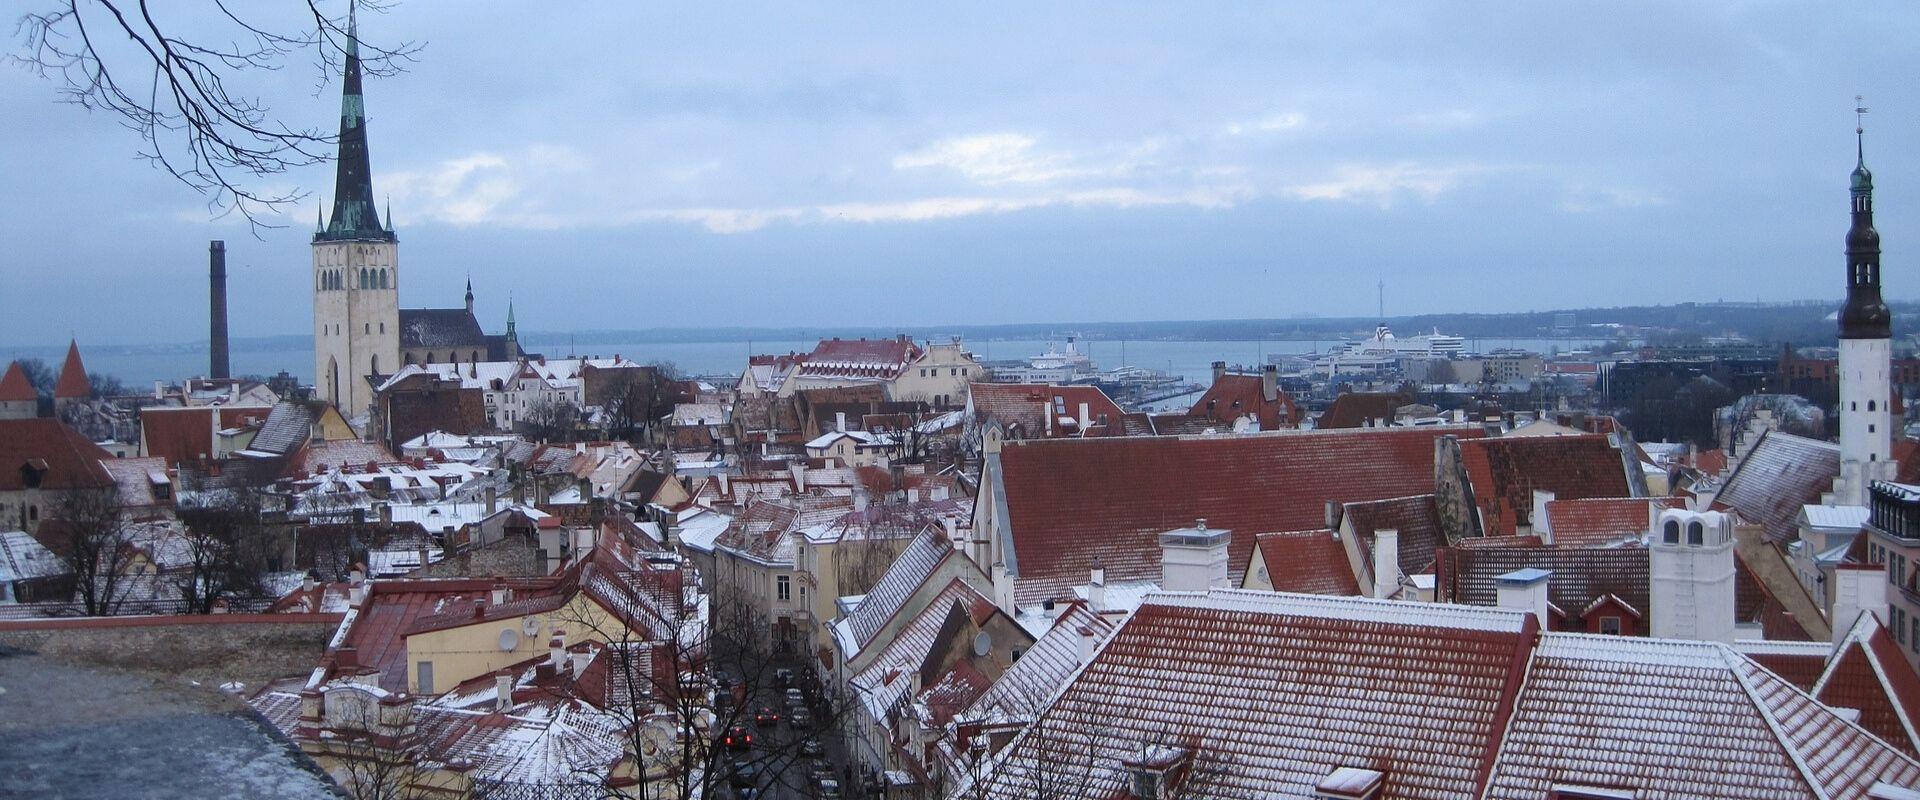 Talvine Tallinn, vanalinna katused